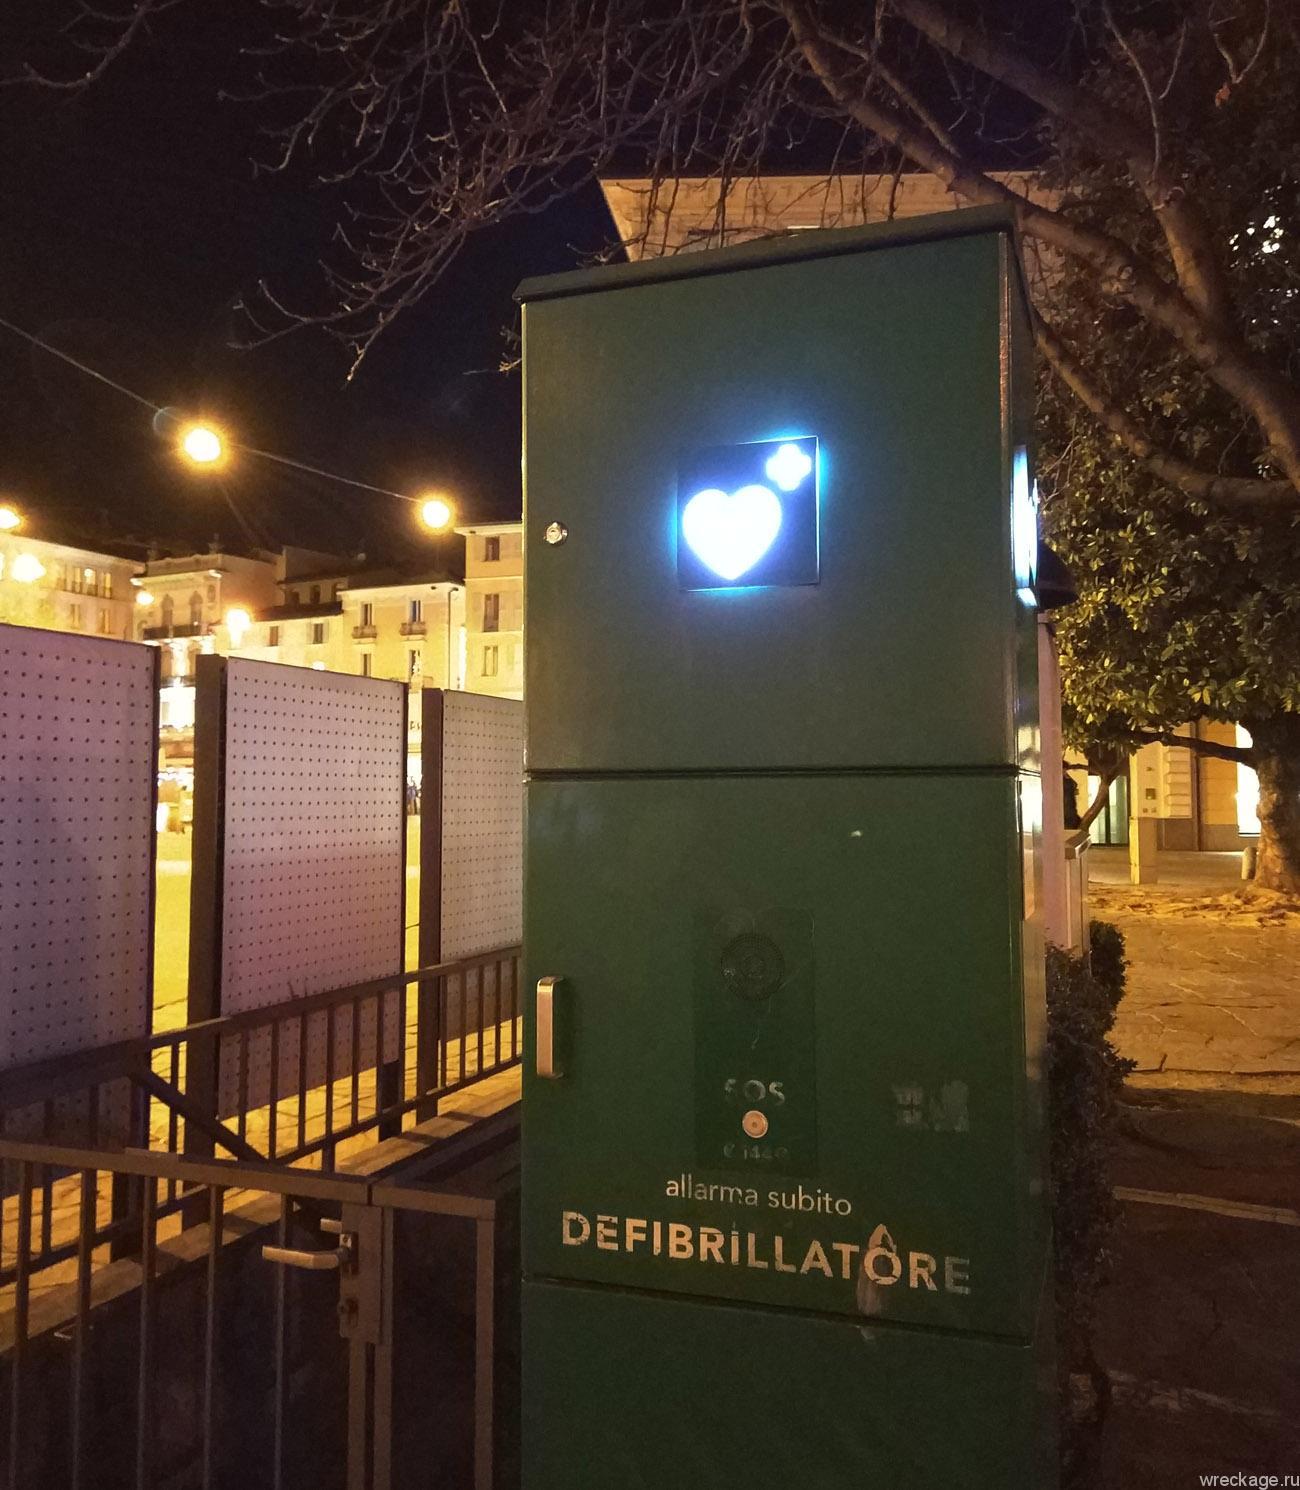 дефибрилятор на улицах города европа